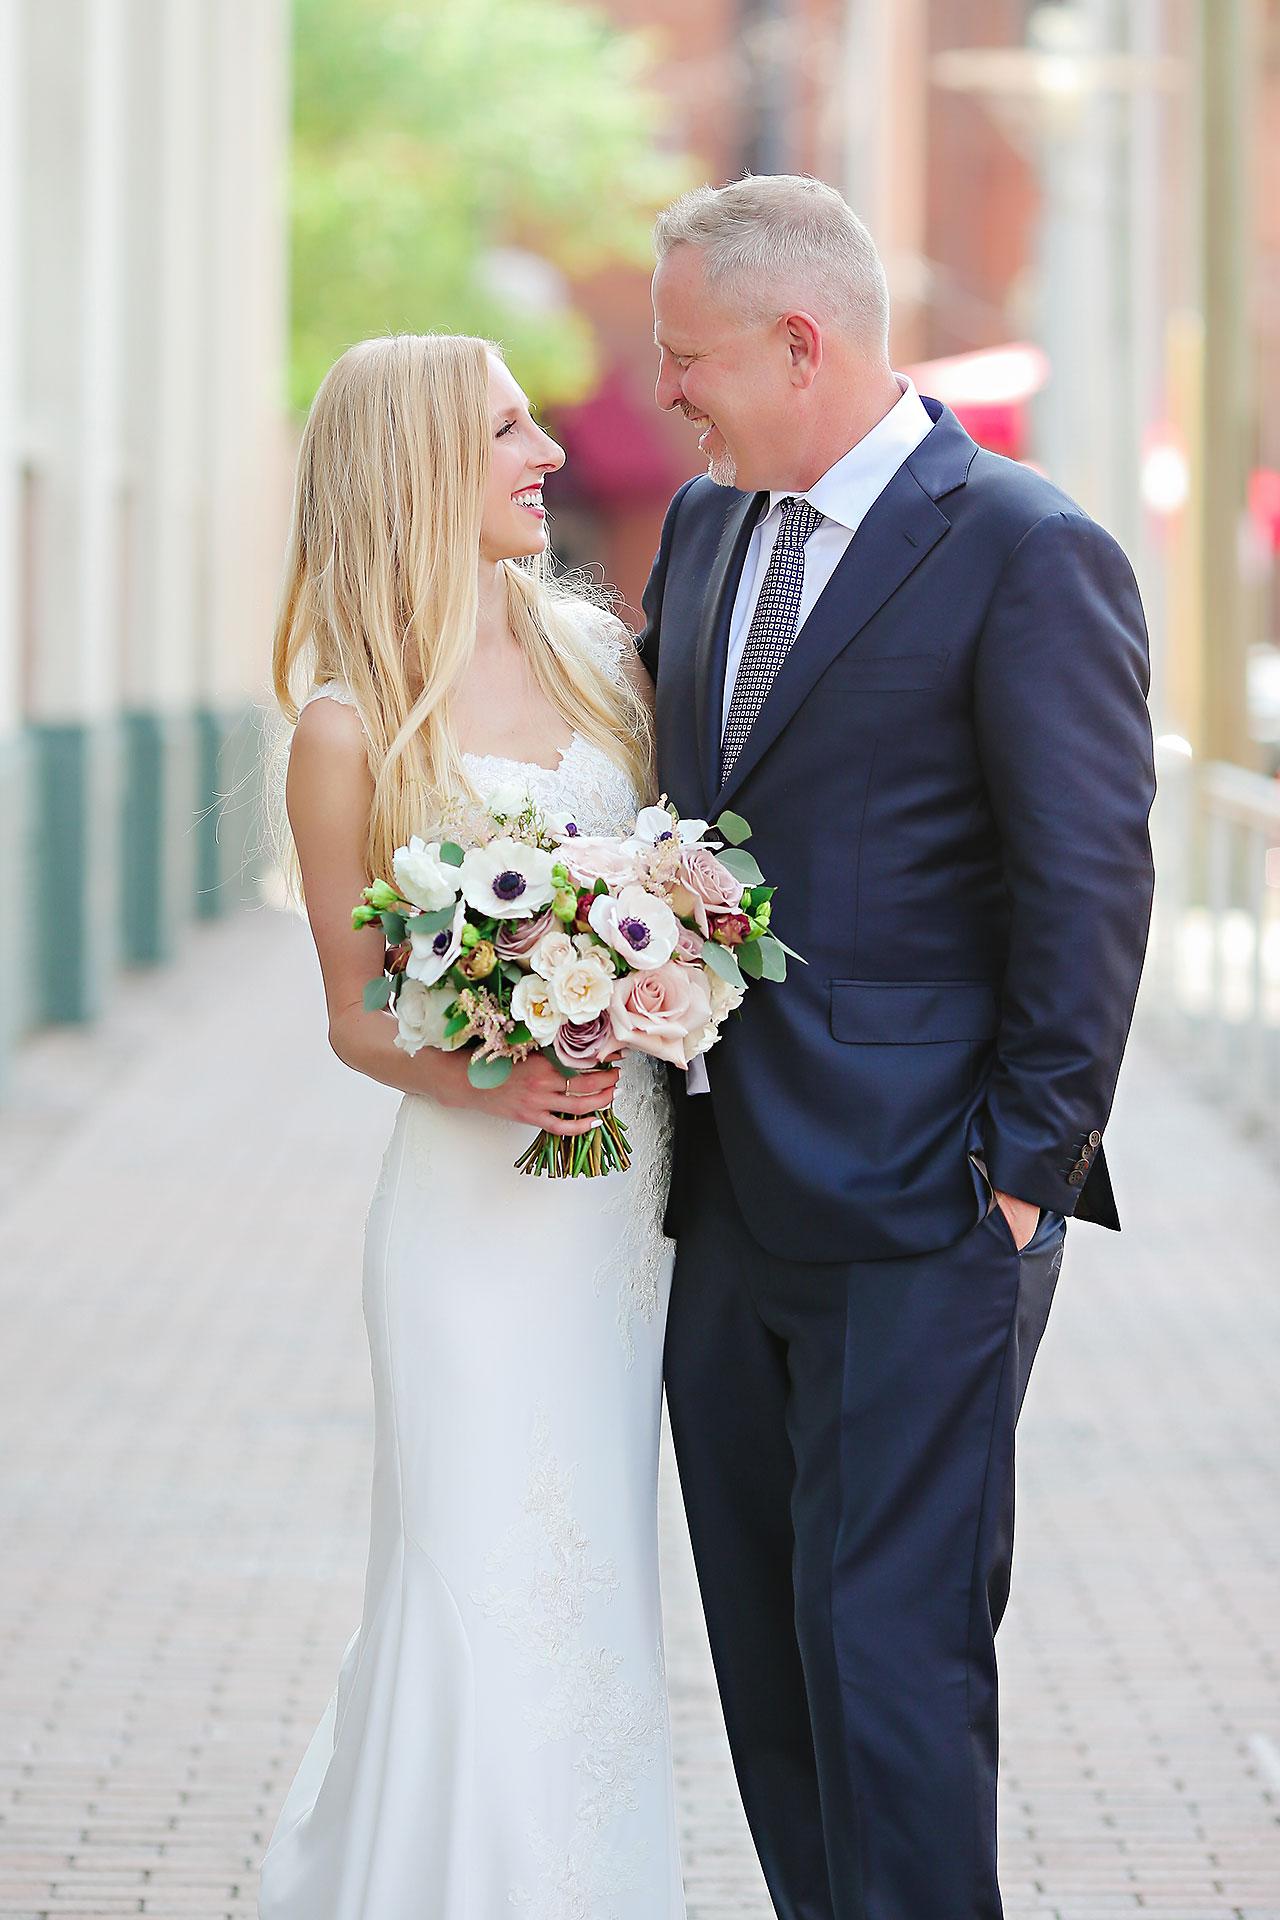 Molly Declan Scottish Rite Indianapolis Wedding 075